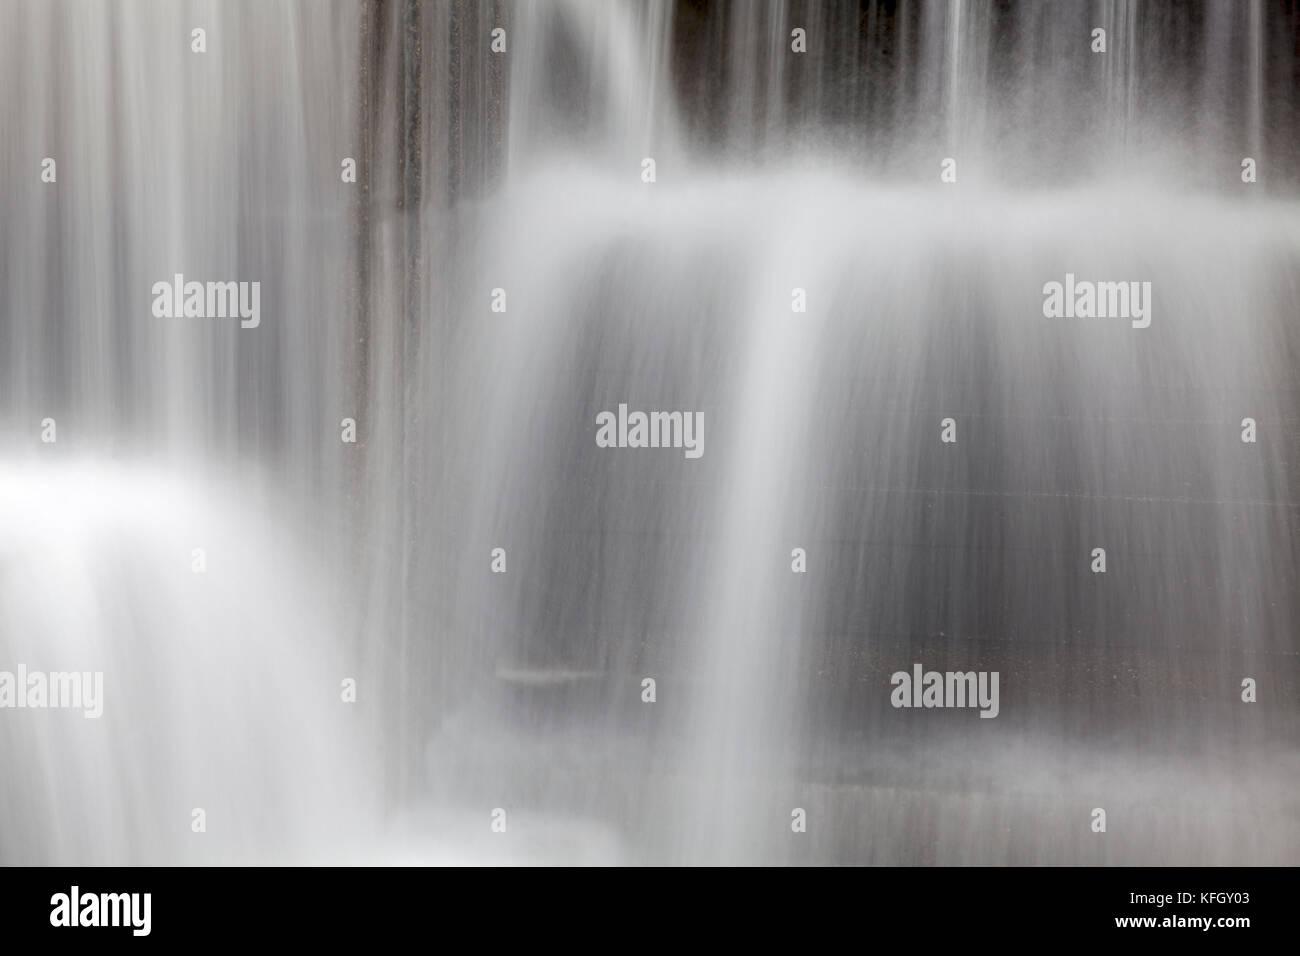 WA14171-00...WASHINGTON - Water feature at Freeway Park in Seattle. - Stock Image